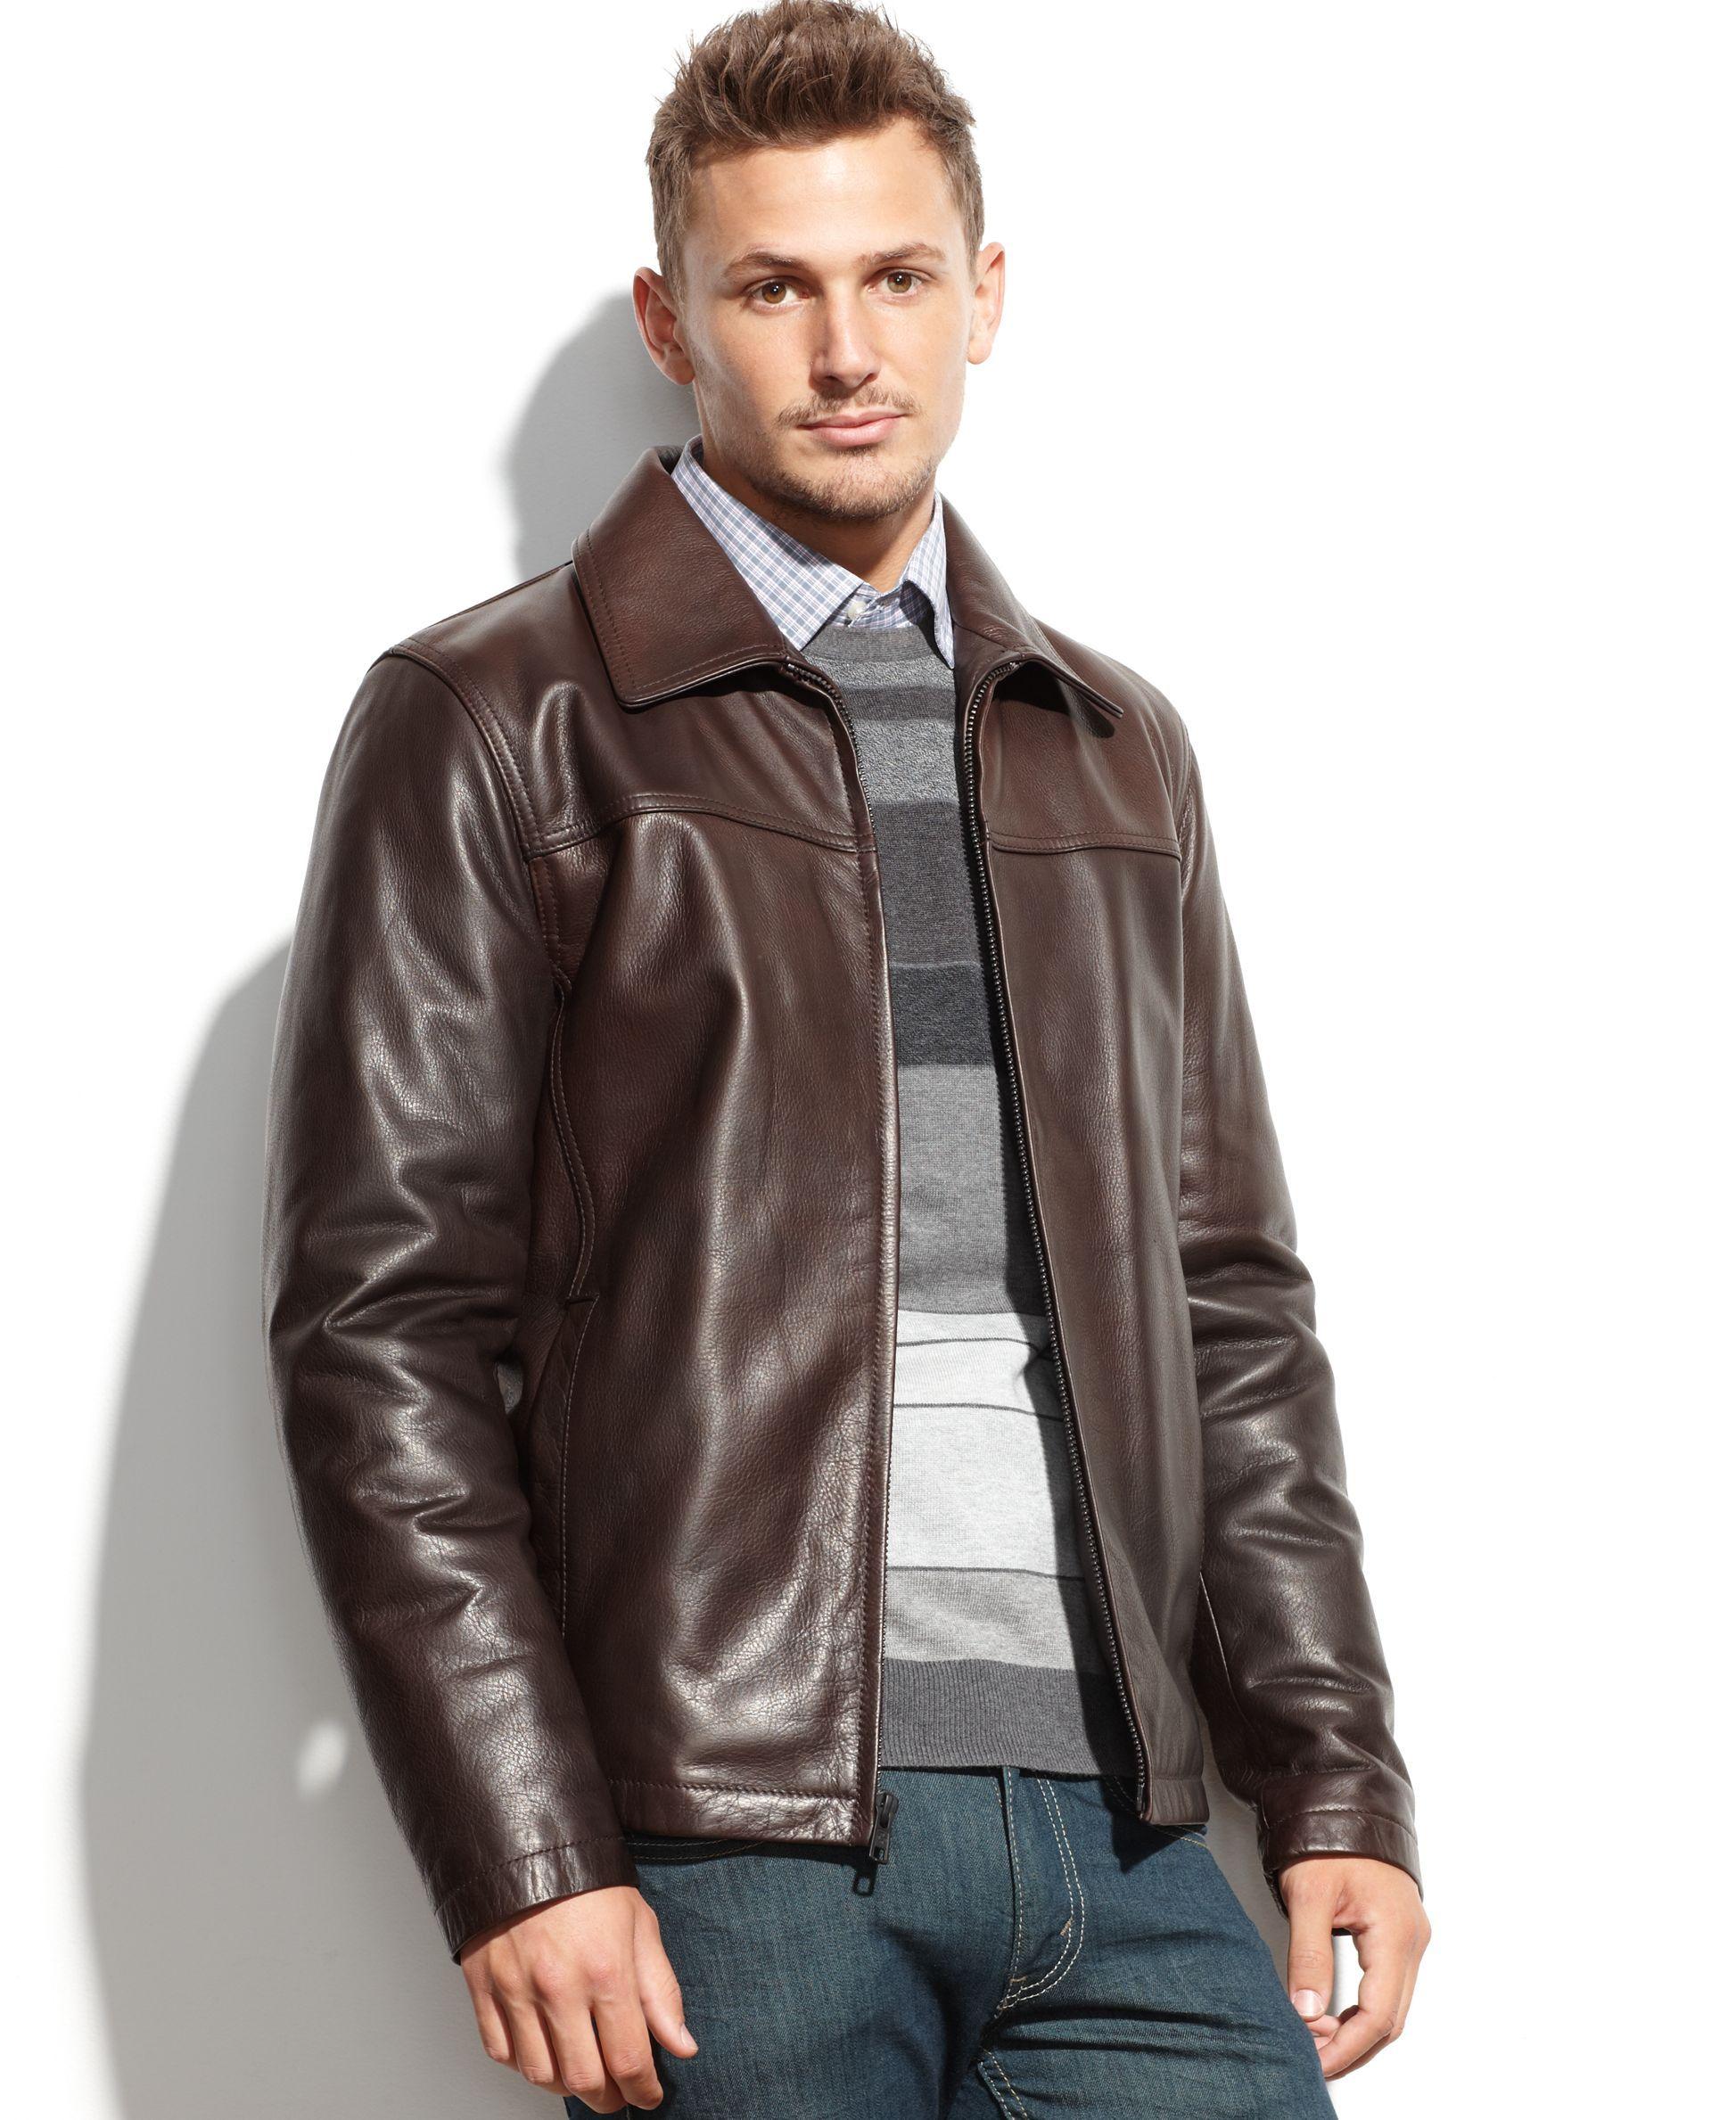 Vince Camuto Jacket Leather Jacket Coats Jackets Men Macy S Leather Jacket Leather Jacket Men Jackets